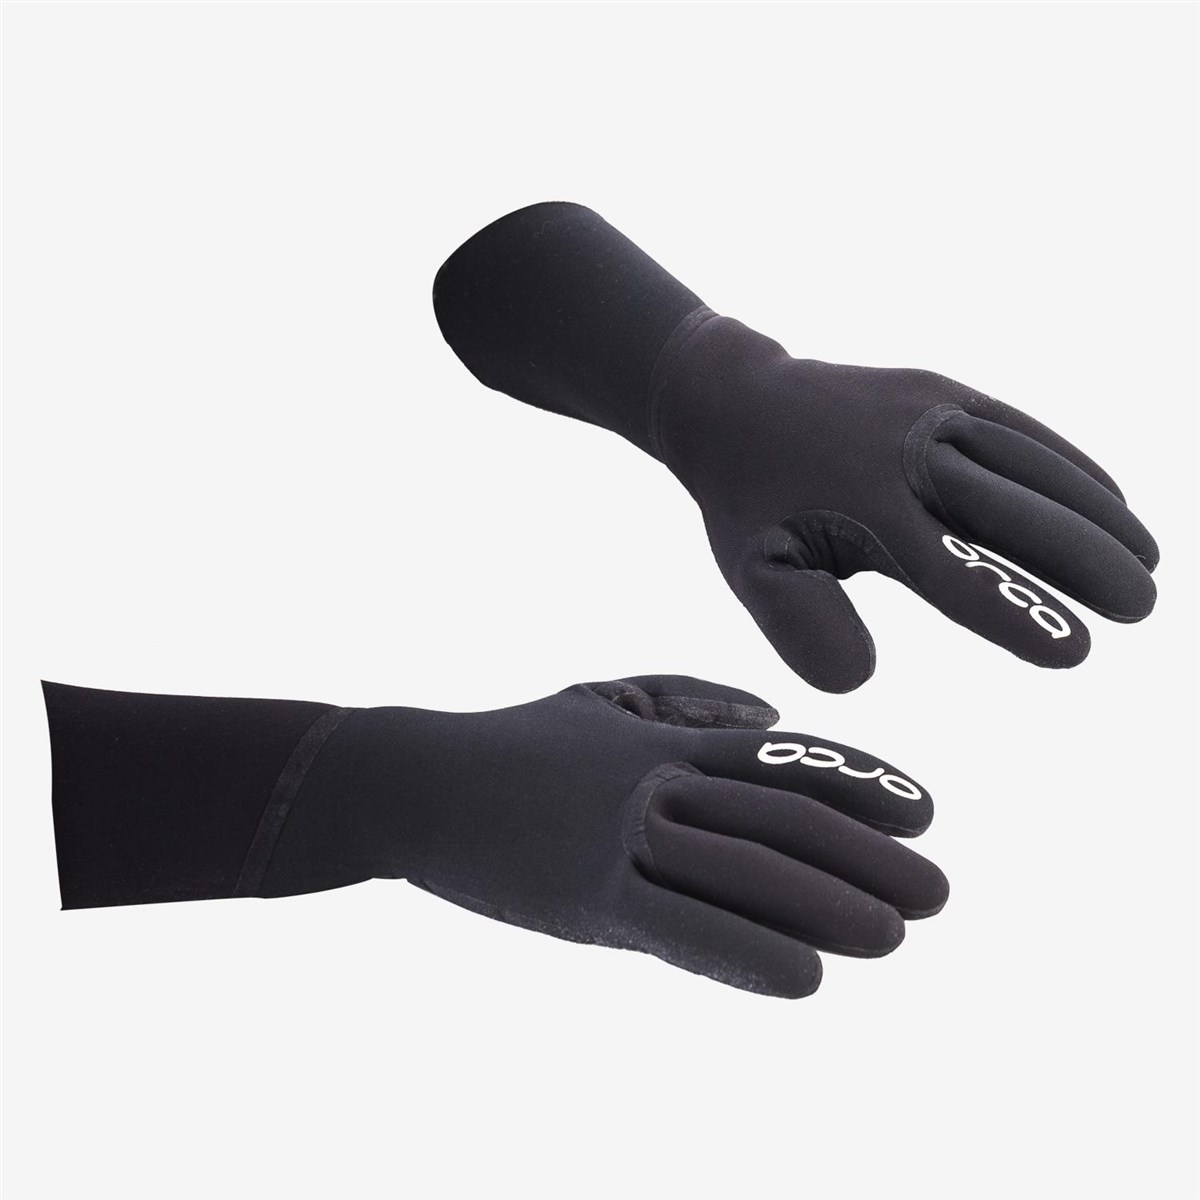 Orca Openwater Swim Gloves | Tri-beklædning